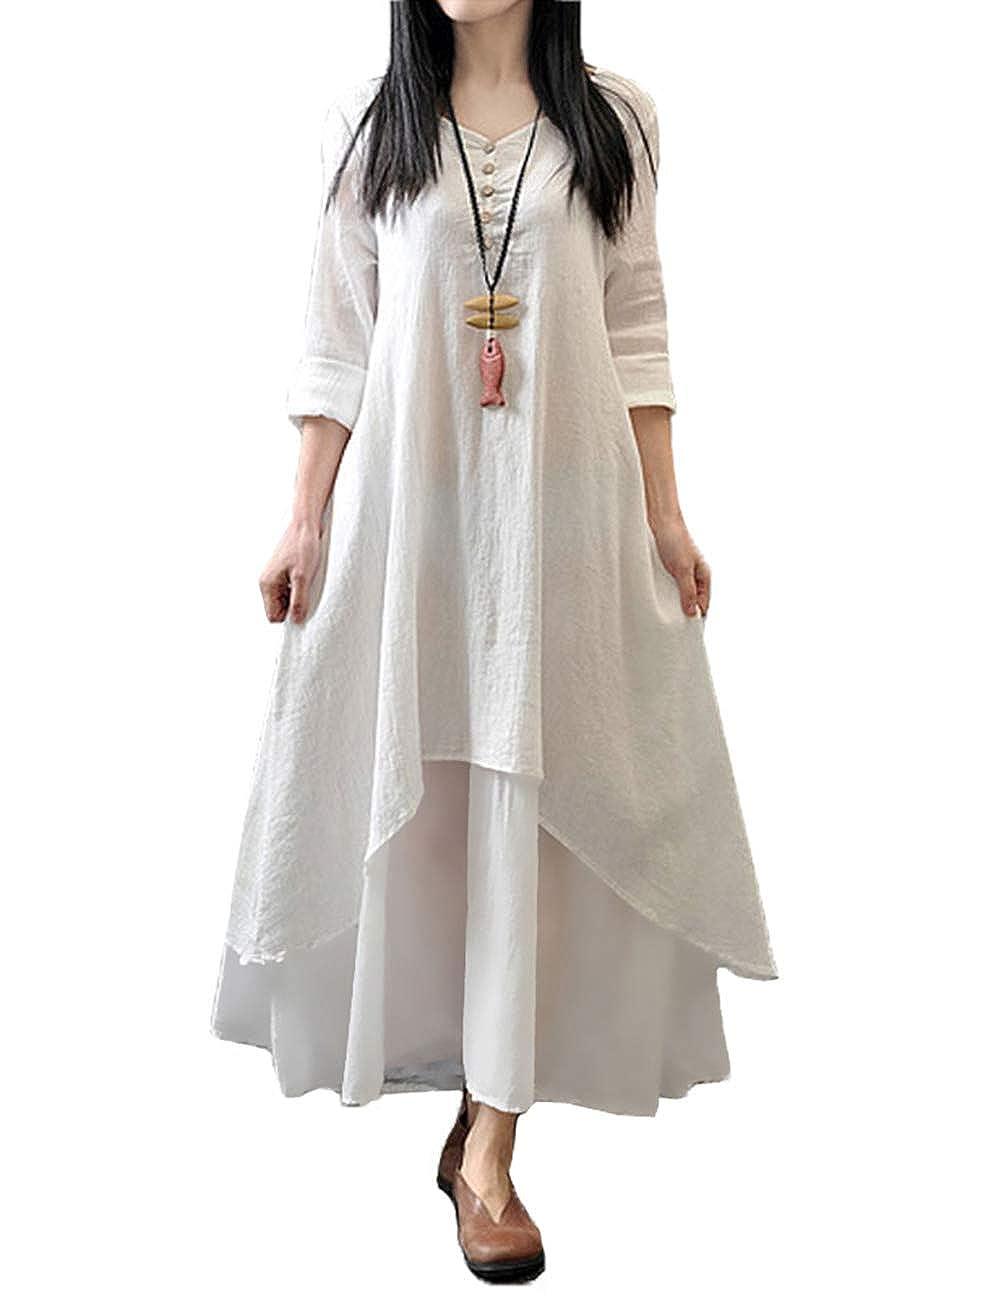 TALLA L. Romacci Vestido Suelto Vestido Ocasional de Las Mujeres Manga Larga Sólida Maxi Vestido Largo de Boho Blanco